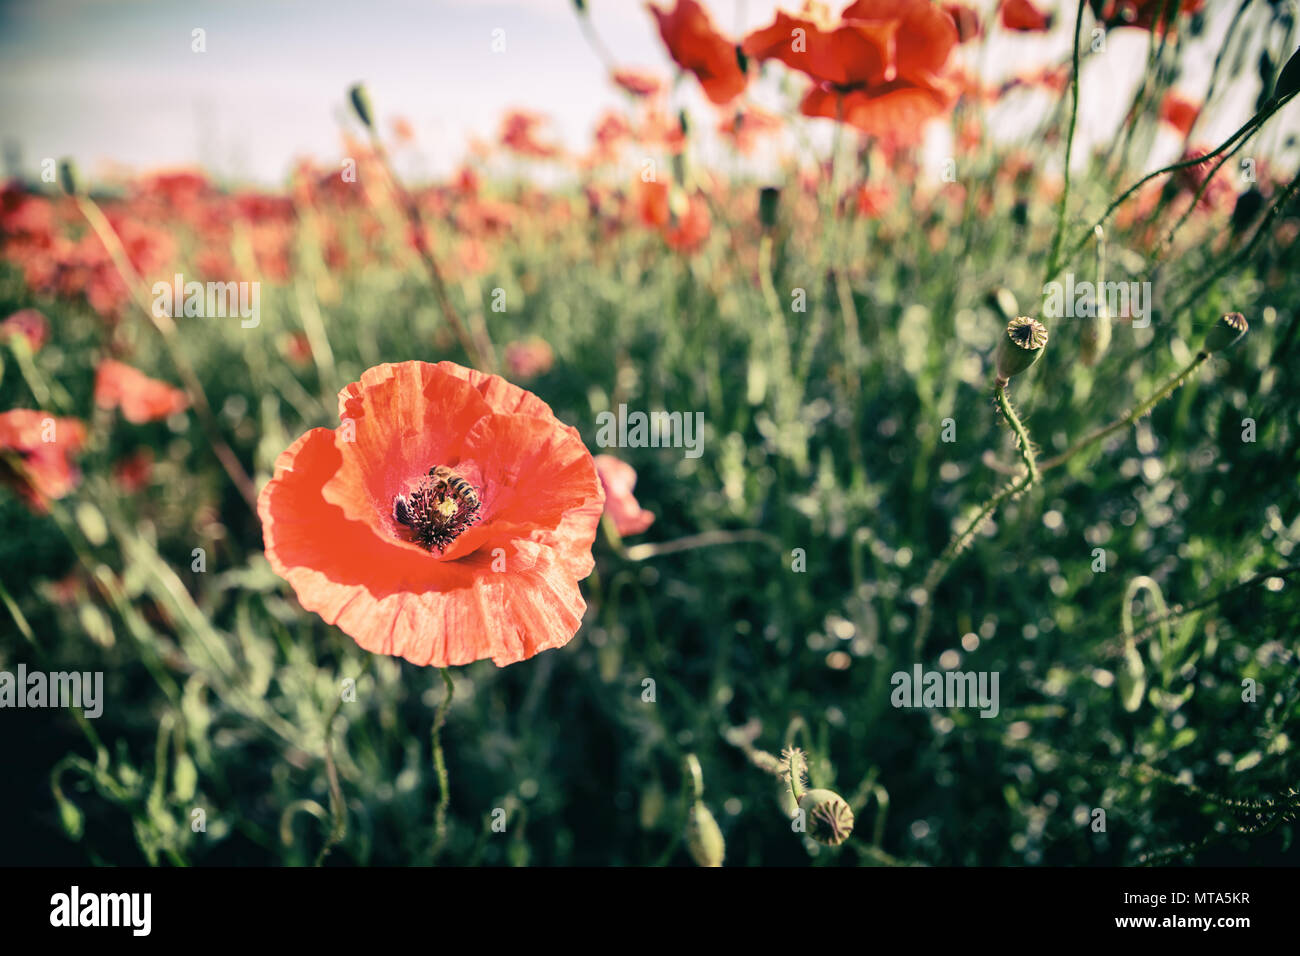 Poppy Flowers Retro Vintage Summer Background Shallow Depth Of